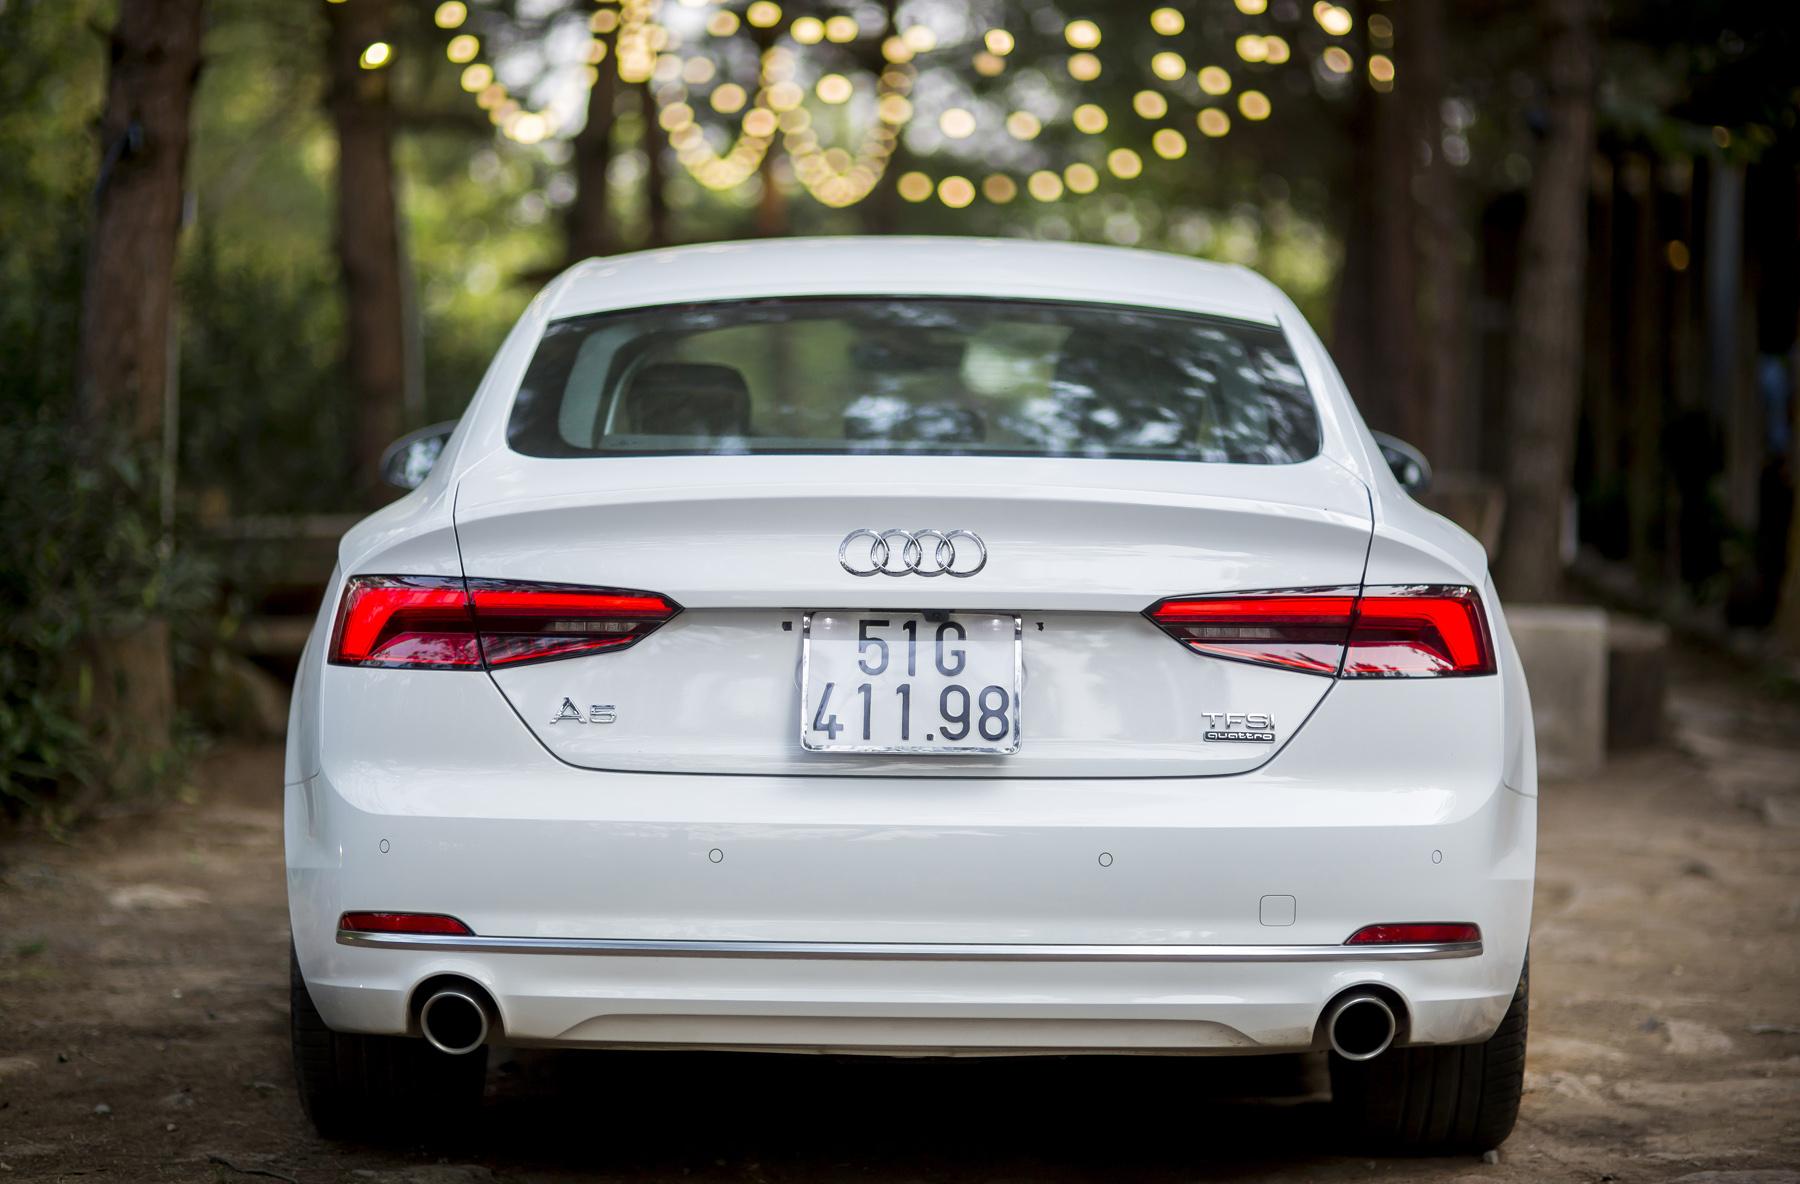 Audi-A5-Sportback-moi-tai-Viet-Nam-An-xang-it-hon-ma-manh-hon-anh-7